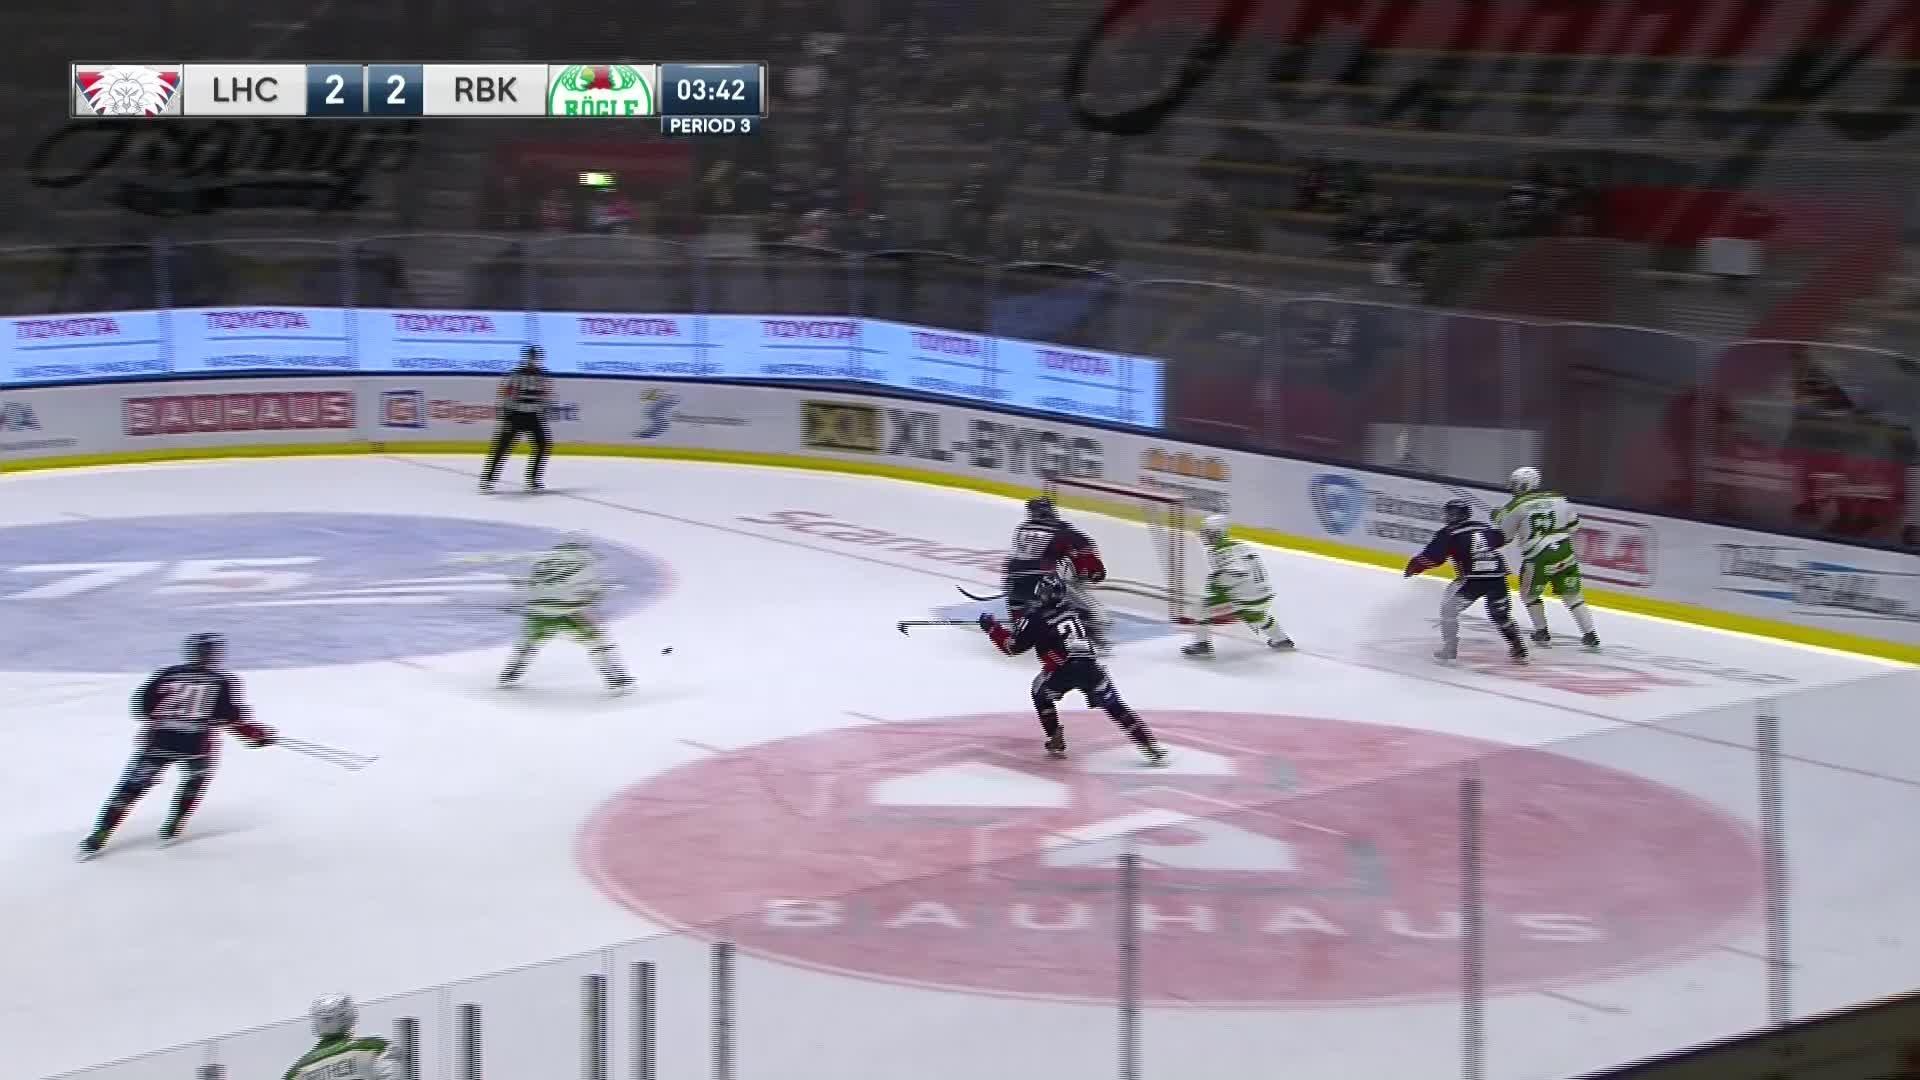 Linköping HC - Rögle BK 2-3